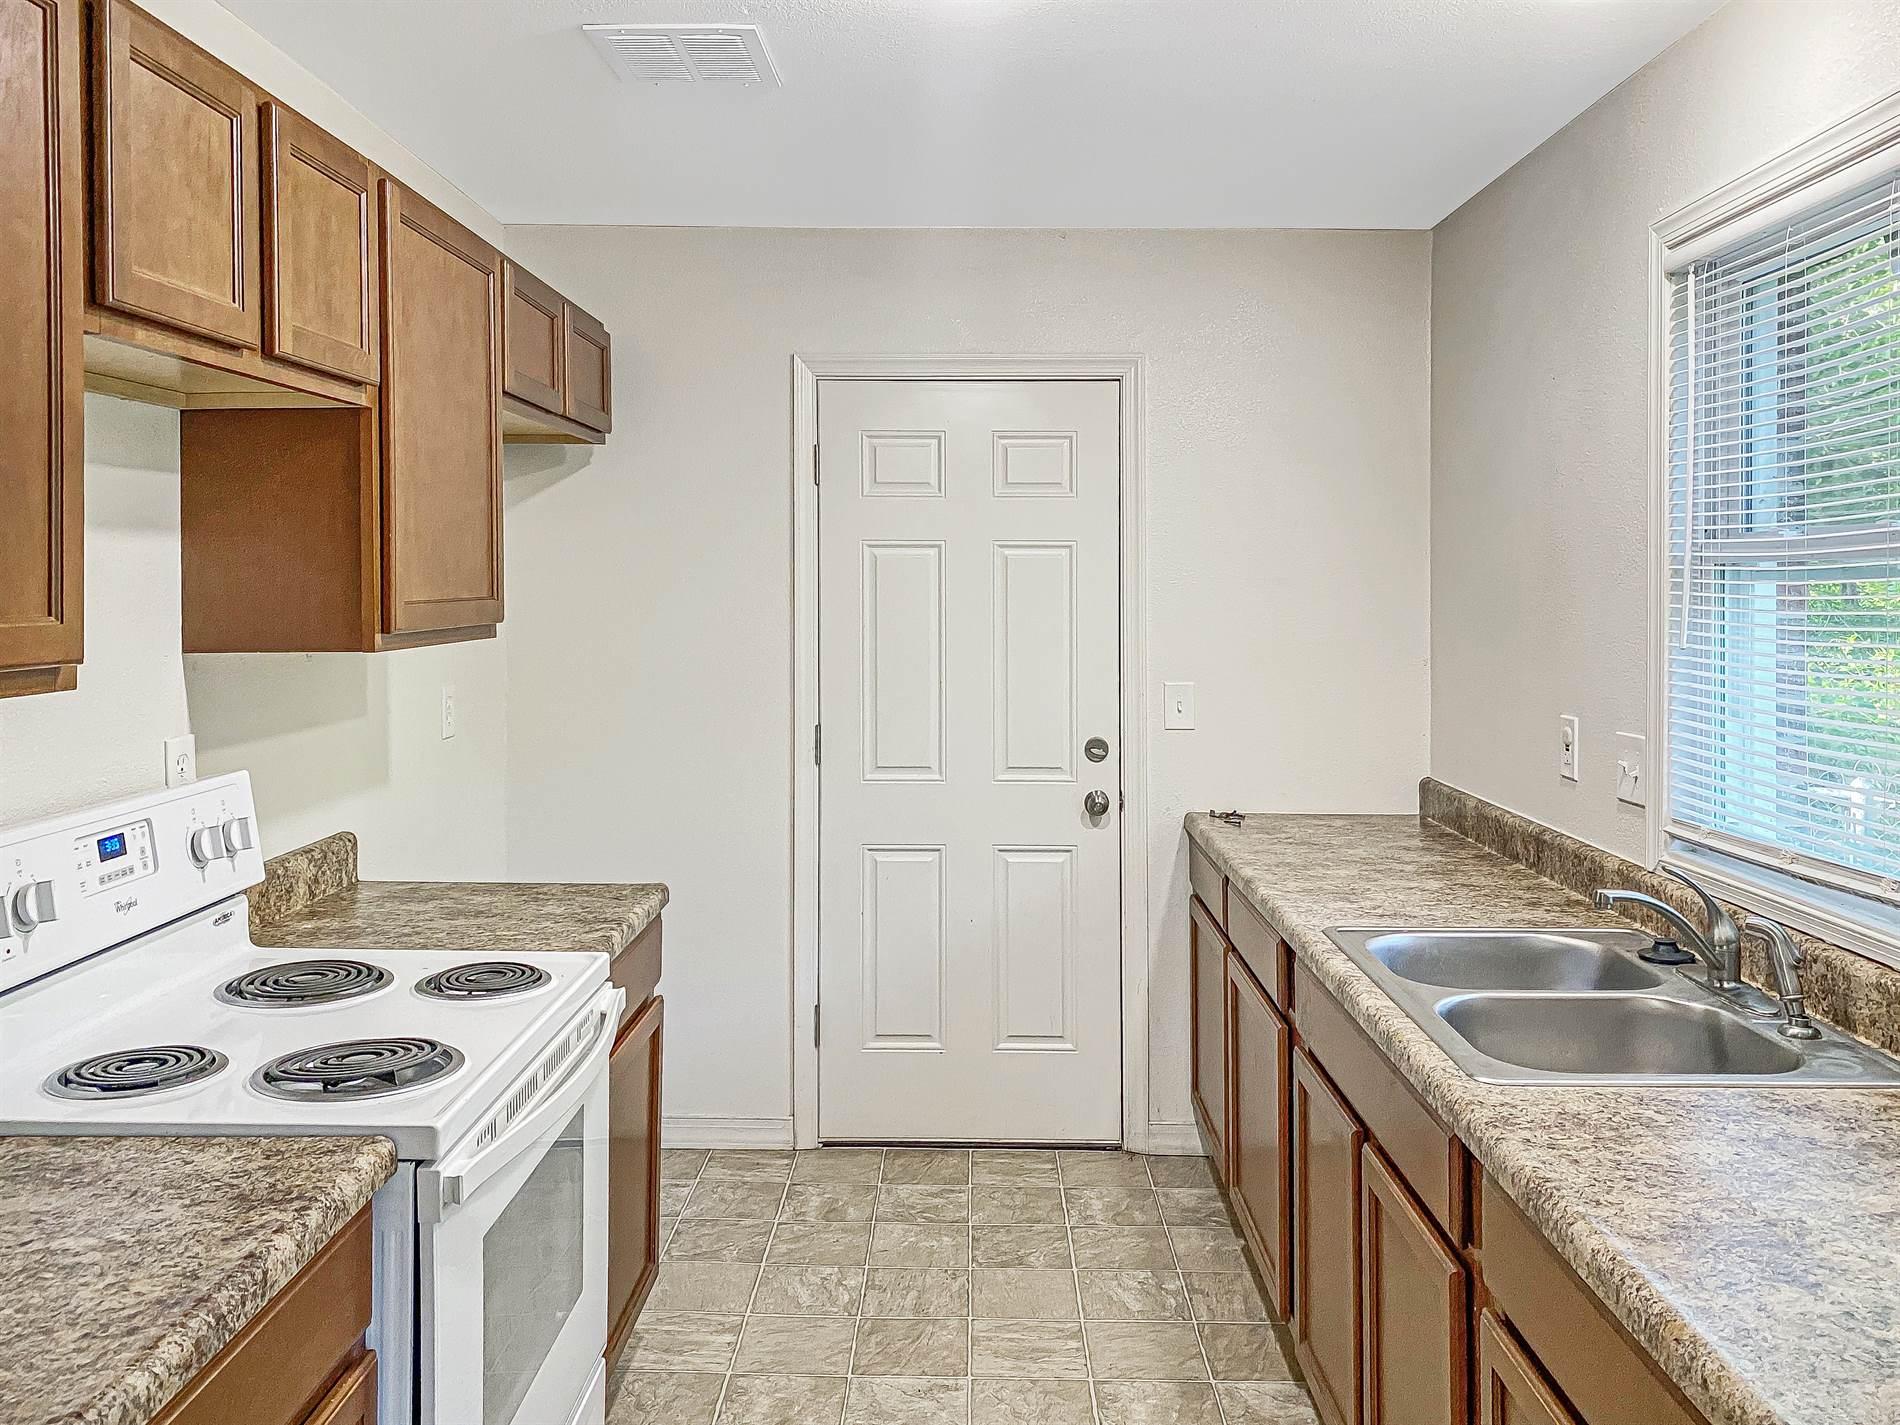 1752 N Old Manor Rd, Wichita, KS 67208